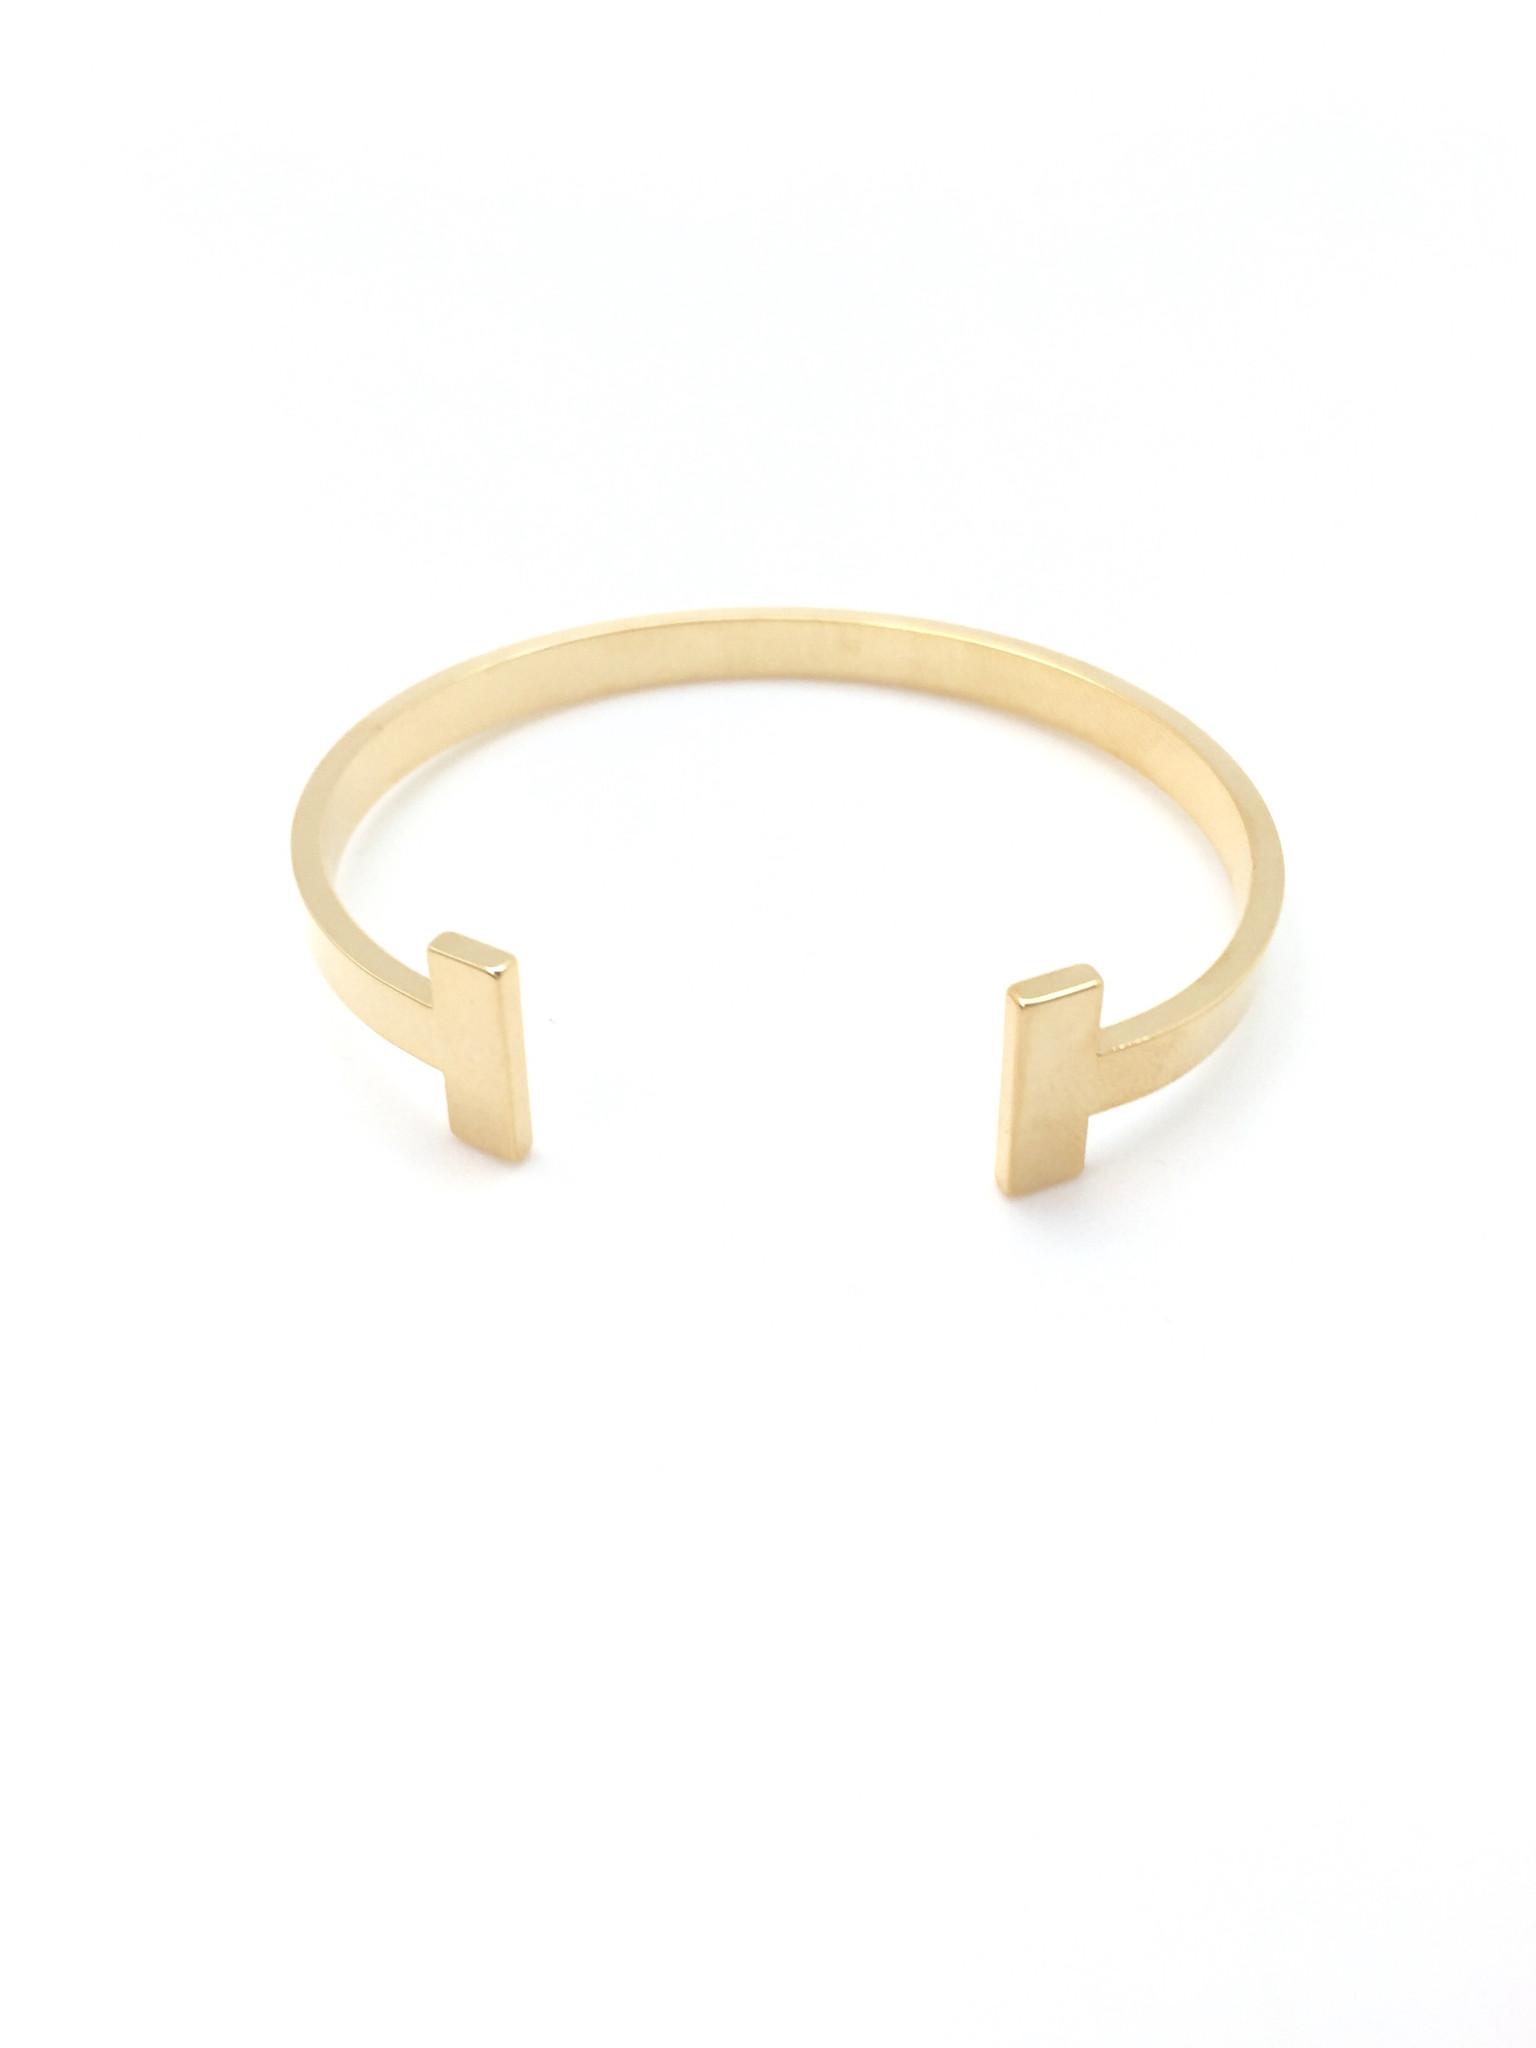 Audrey Bracelet $22